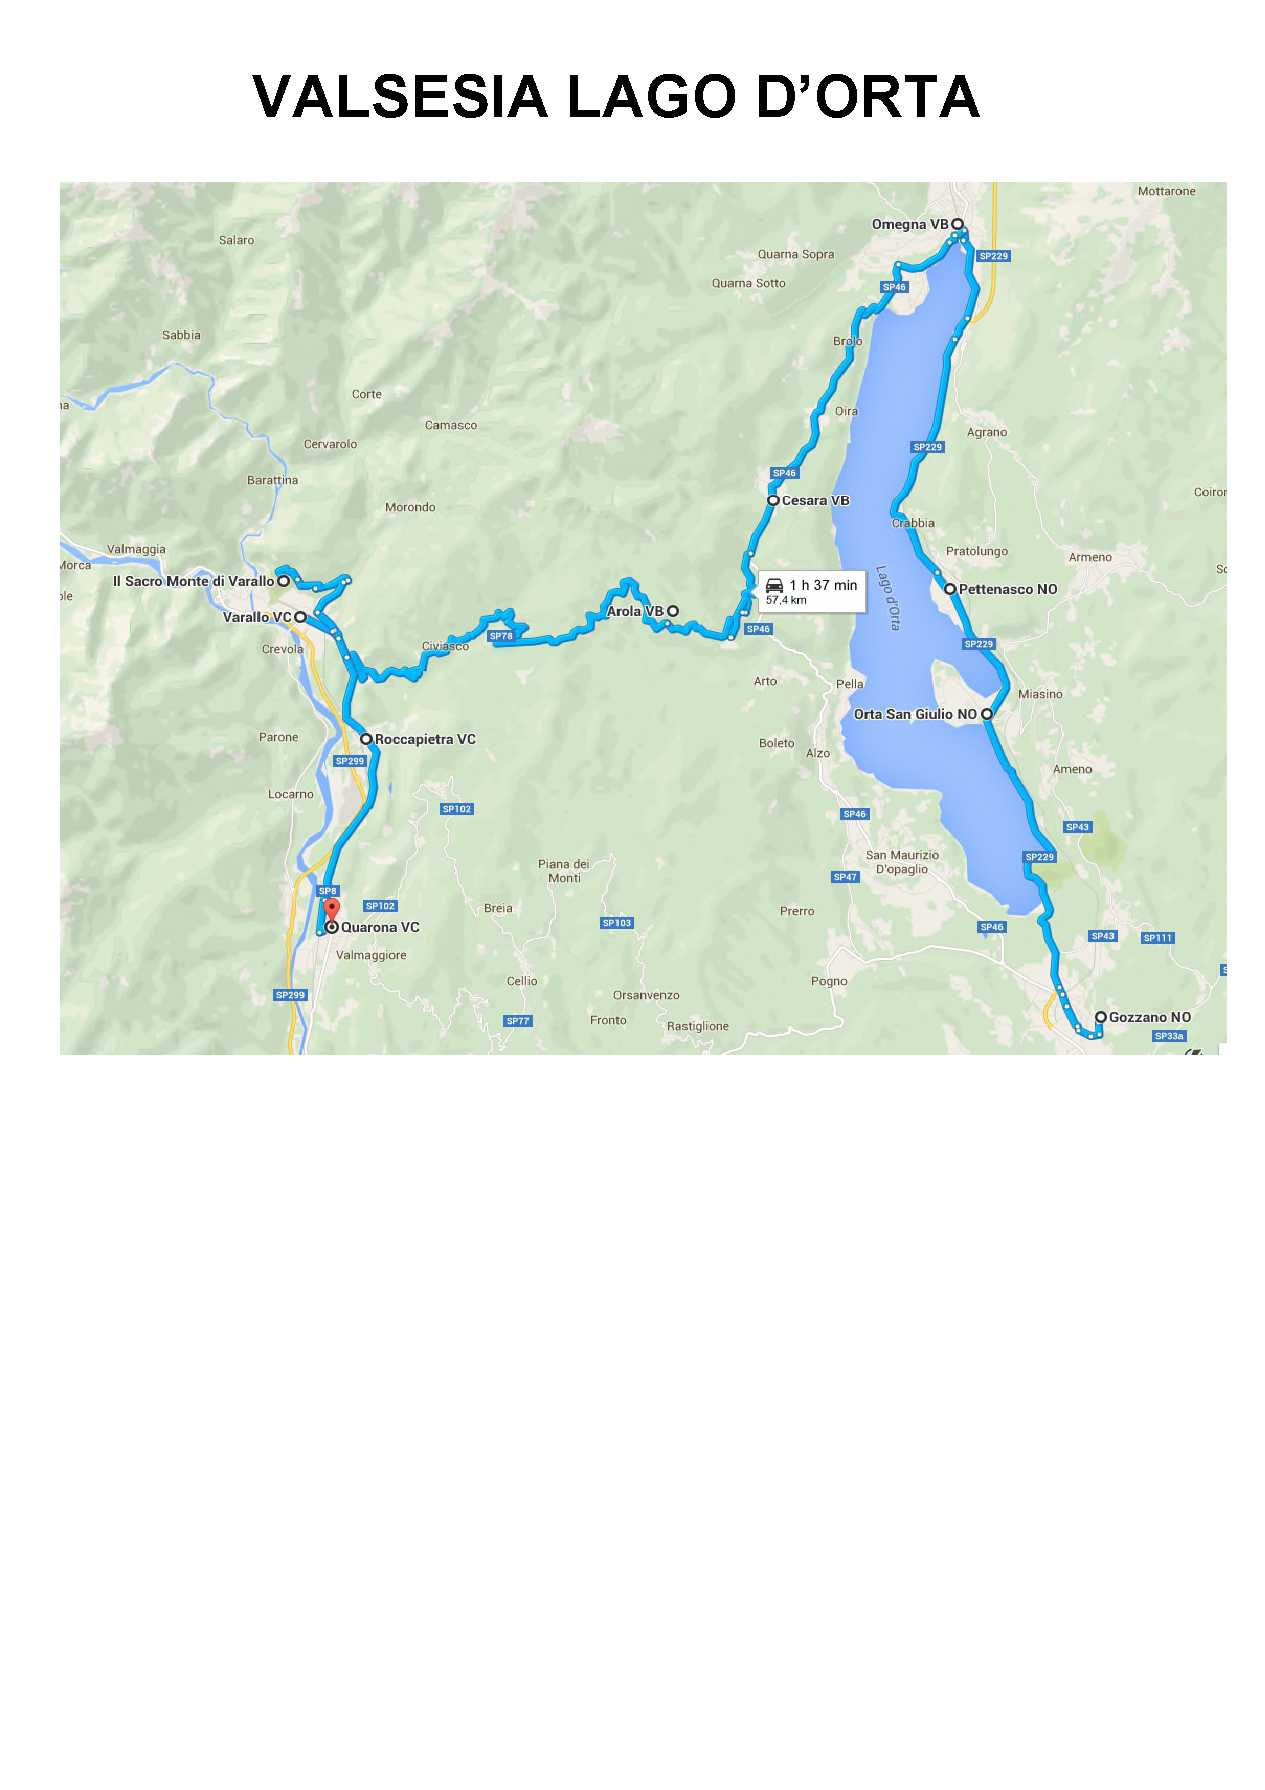 Valsesia lago d'Orta_2